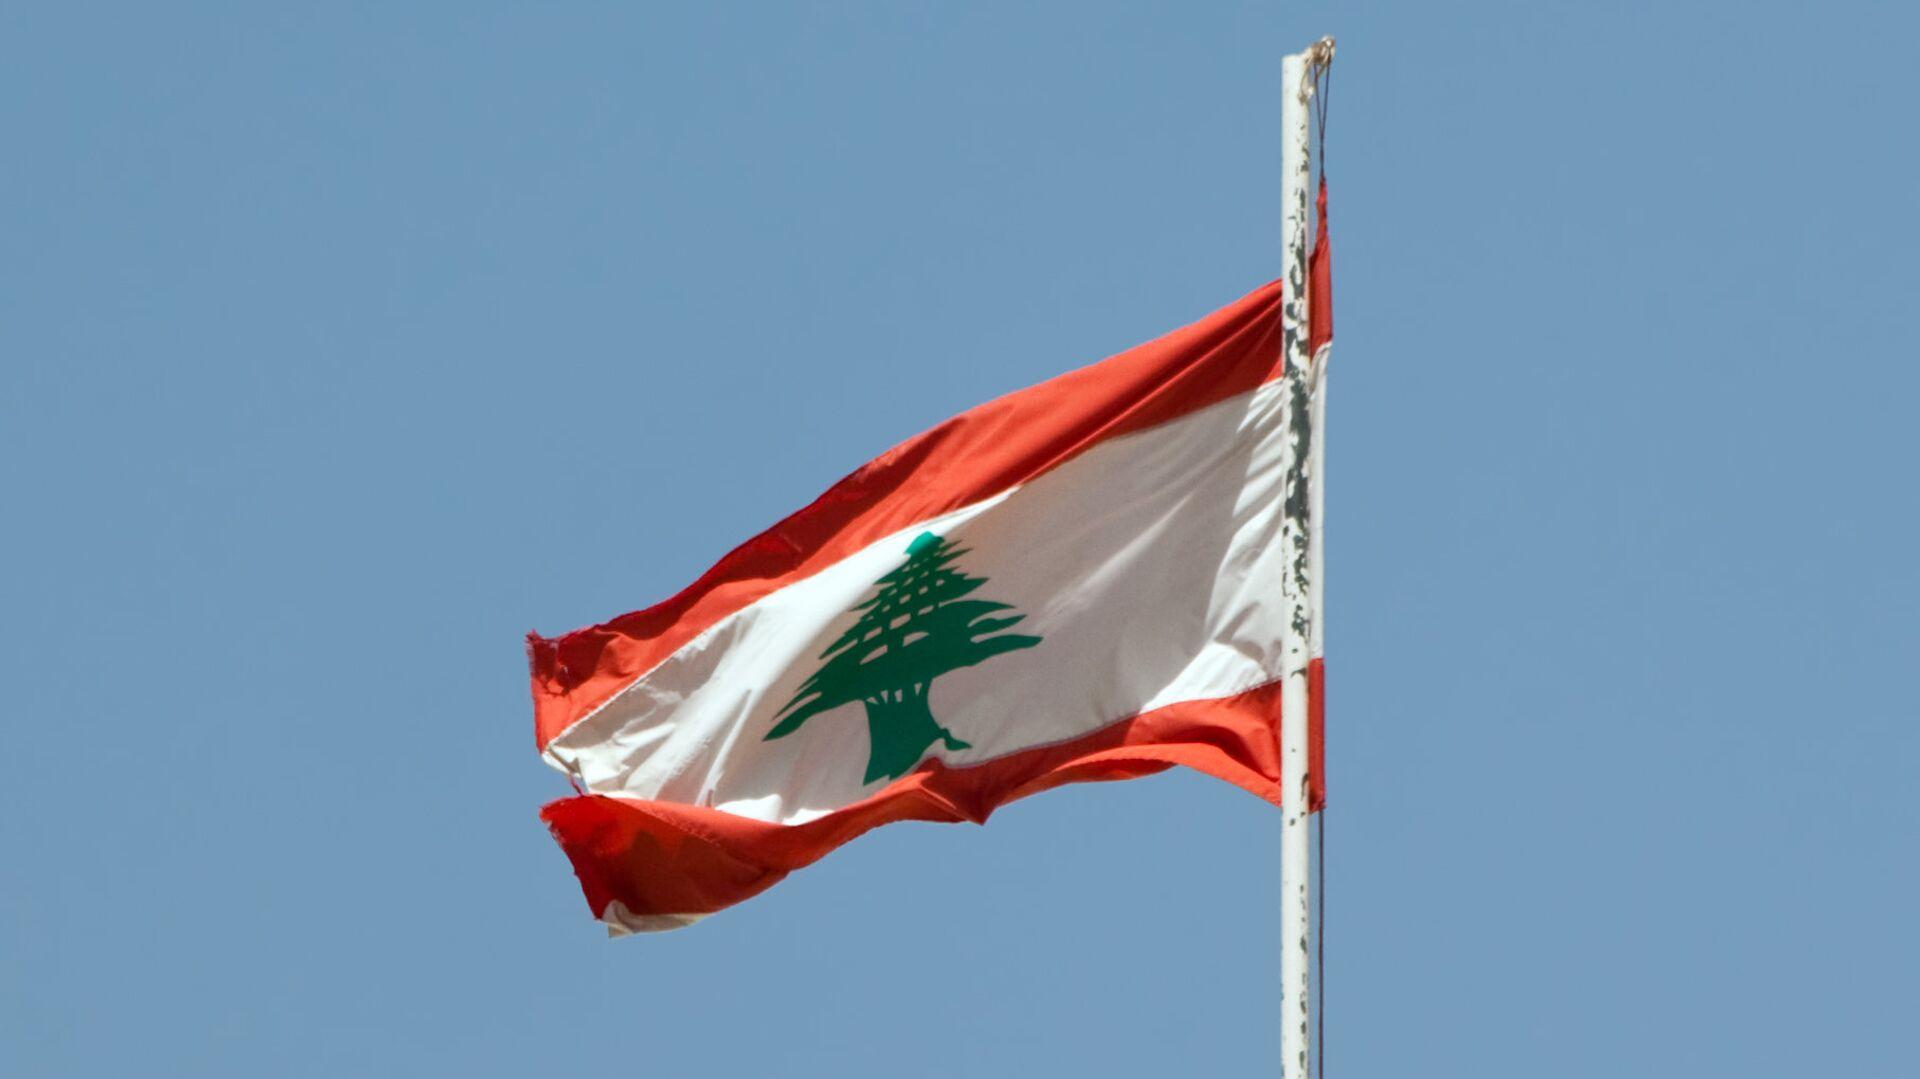 Bandera del Líbano - Sputnik Mundo, 1920, 28.04.2021